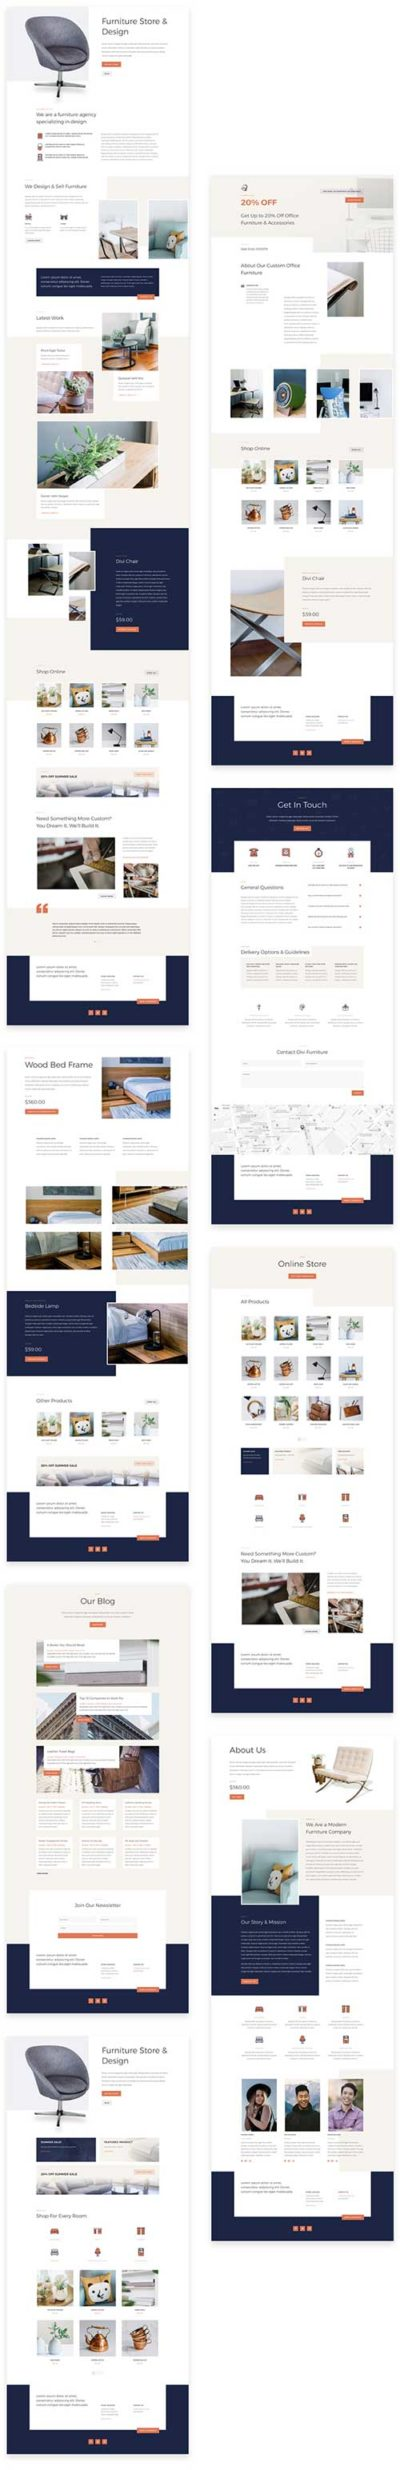 divi layouts furniture store